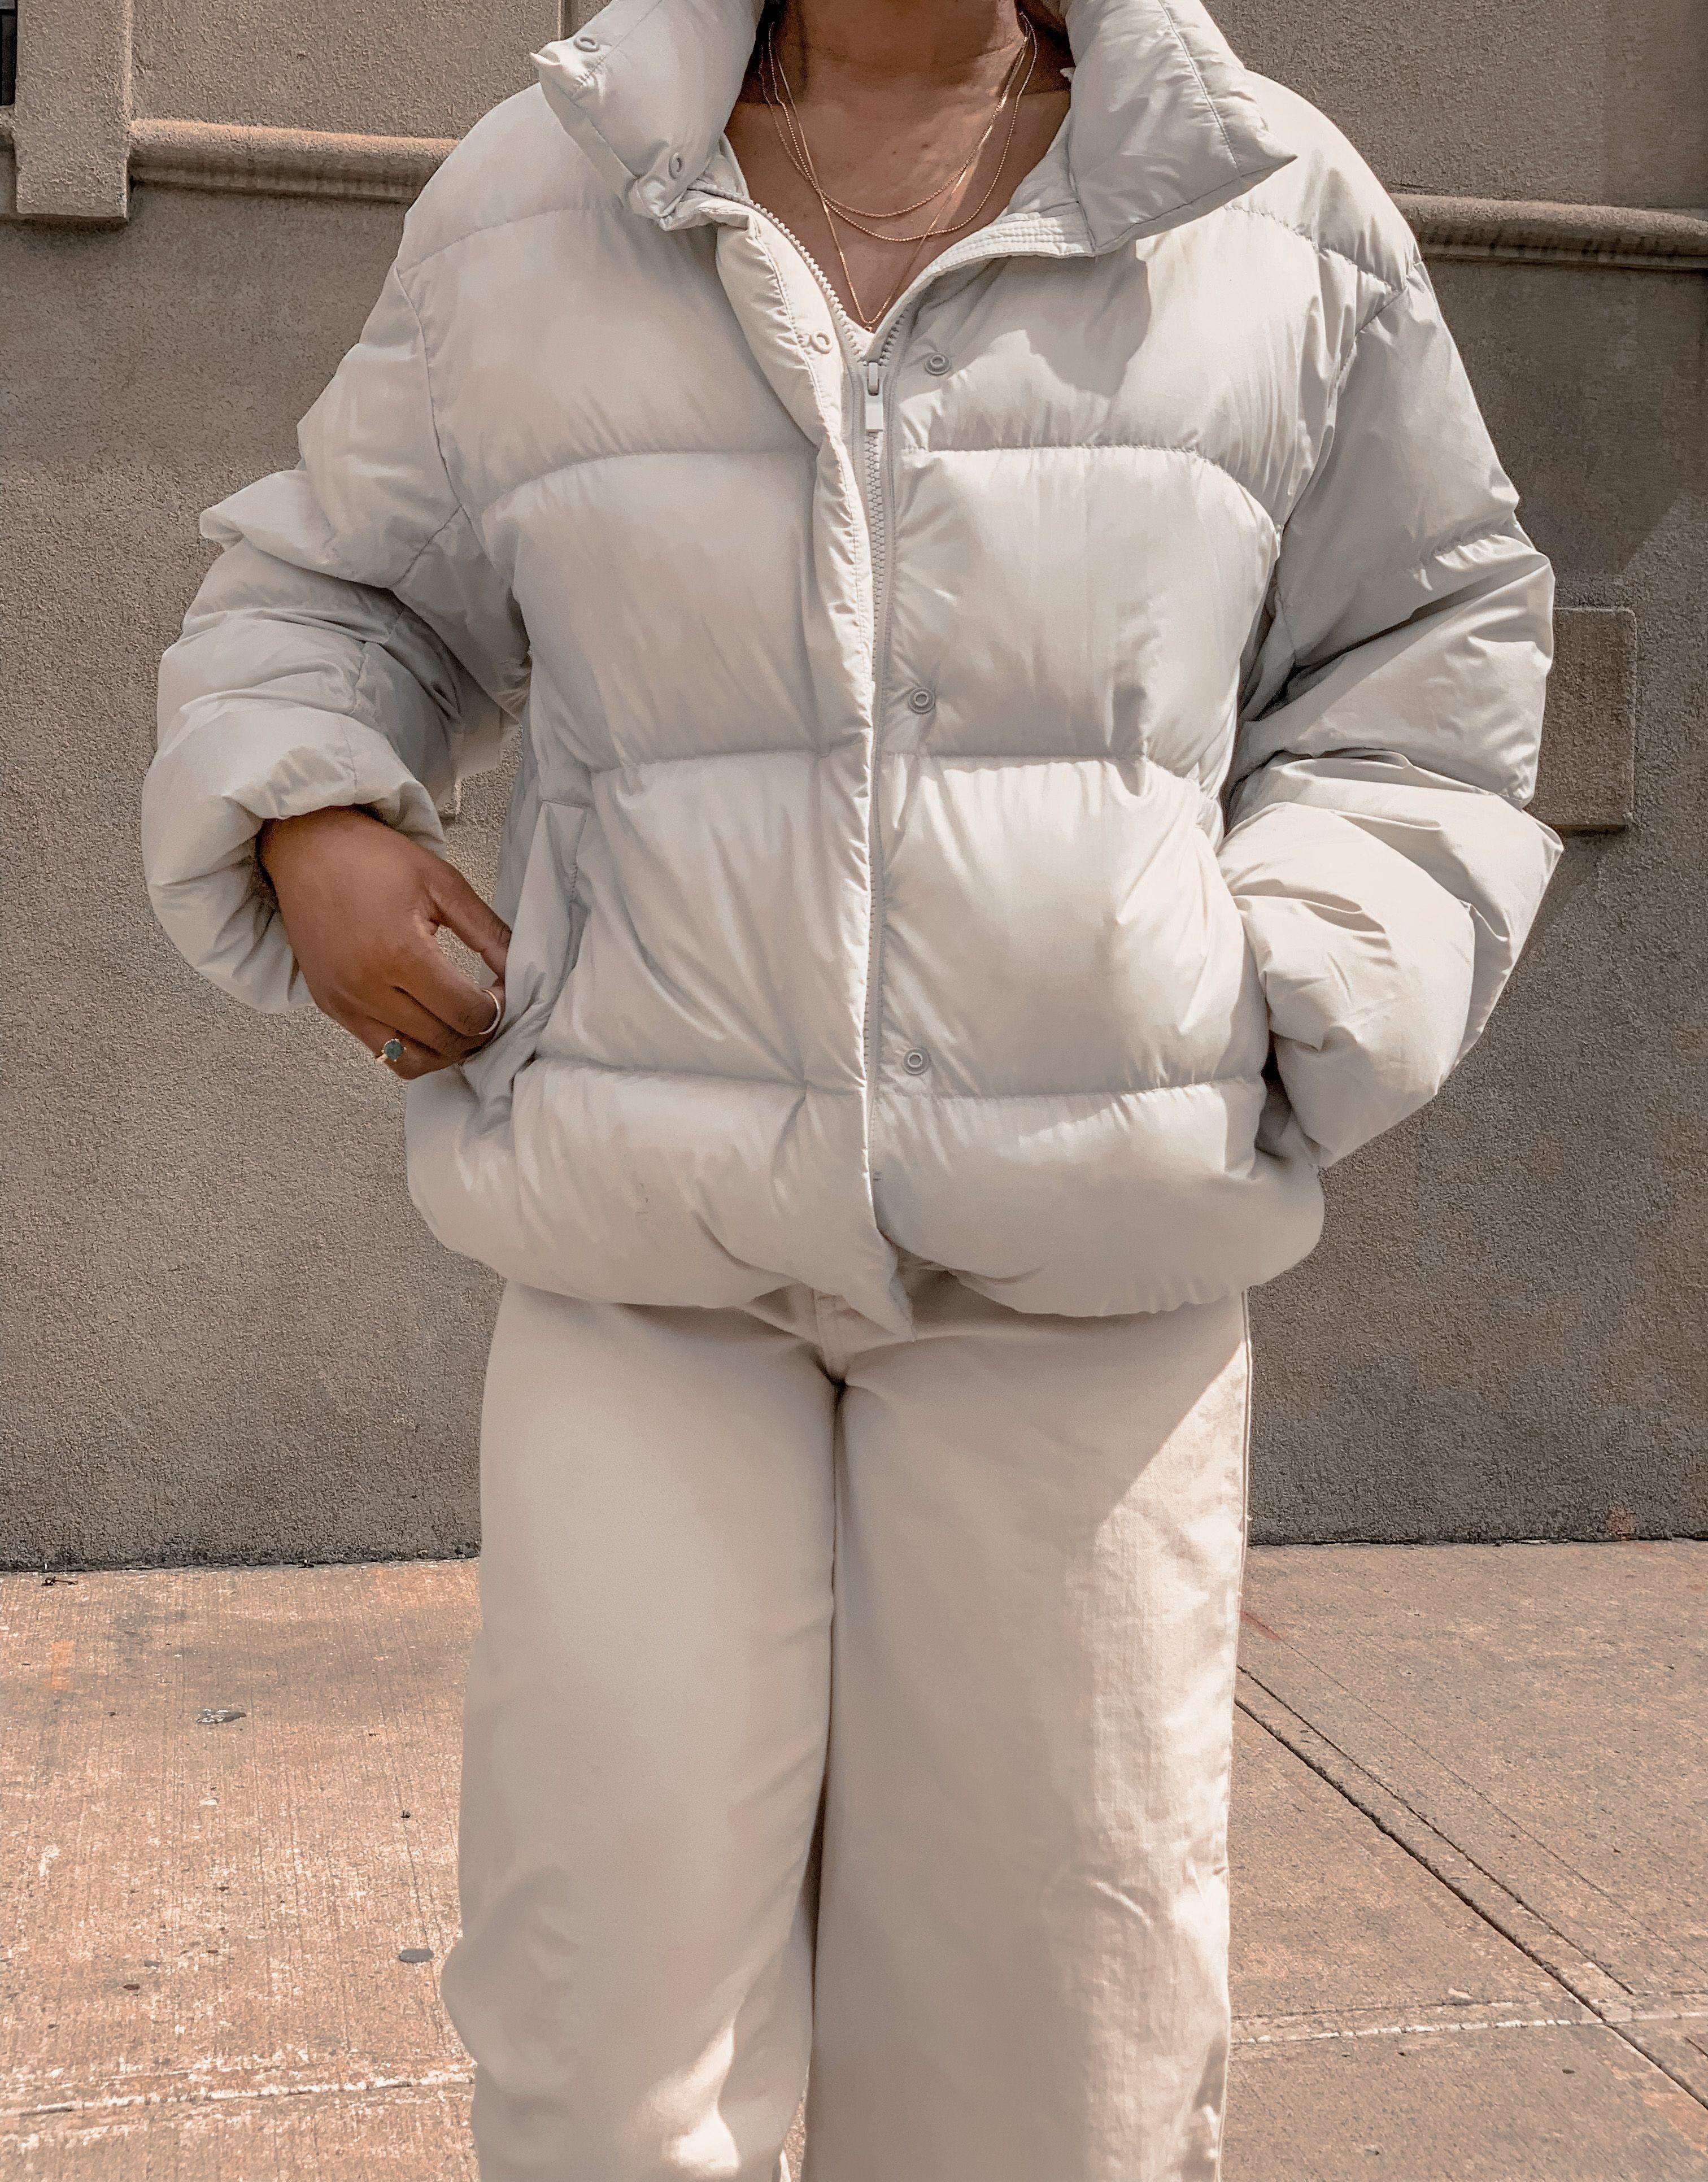 Uniqlo Cocoon Puffer Jacket [ 3863 x 3024 Pixel ]